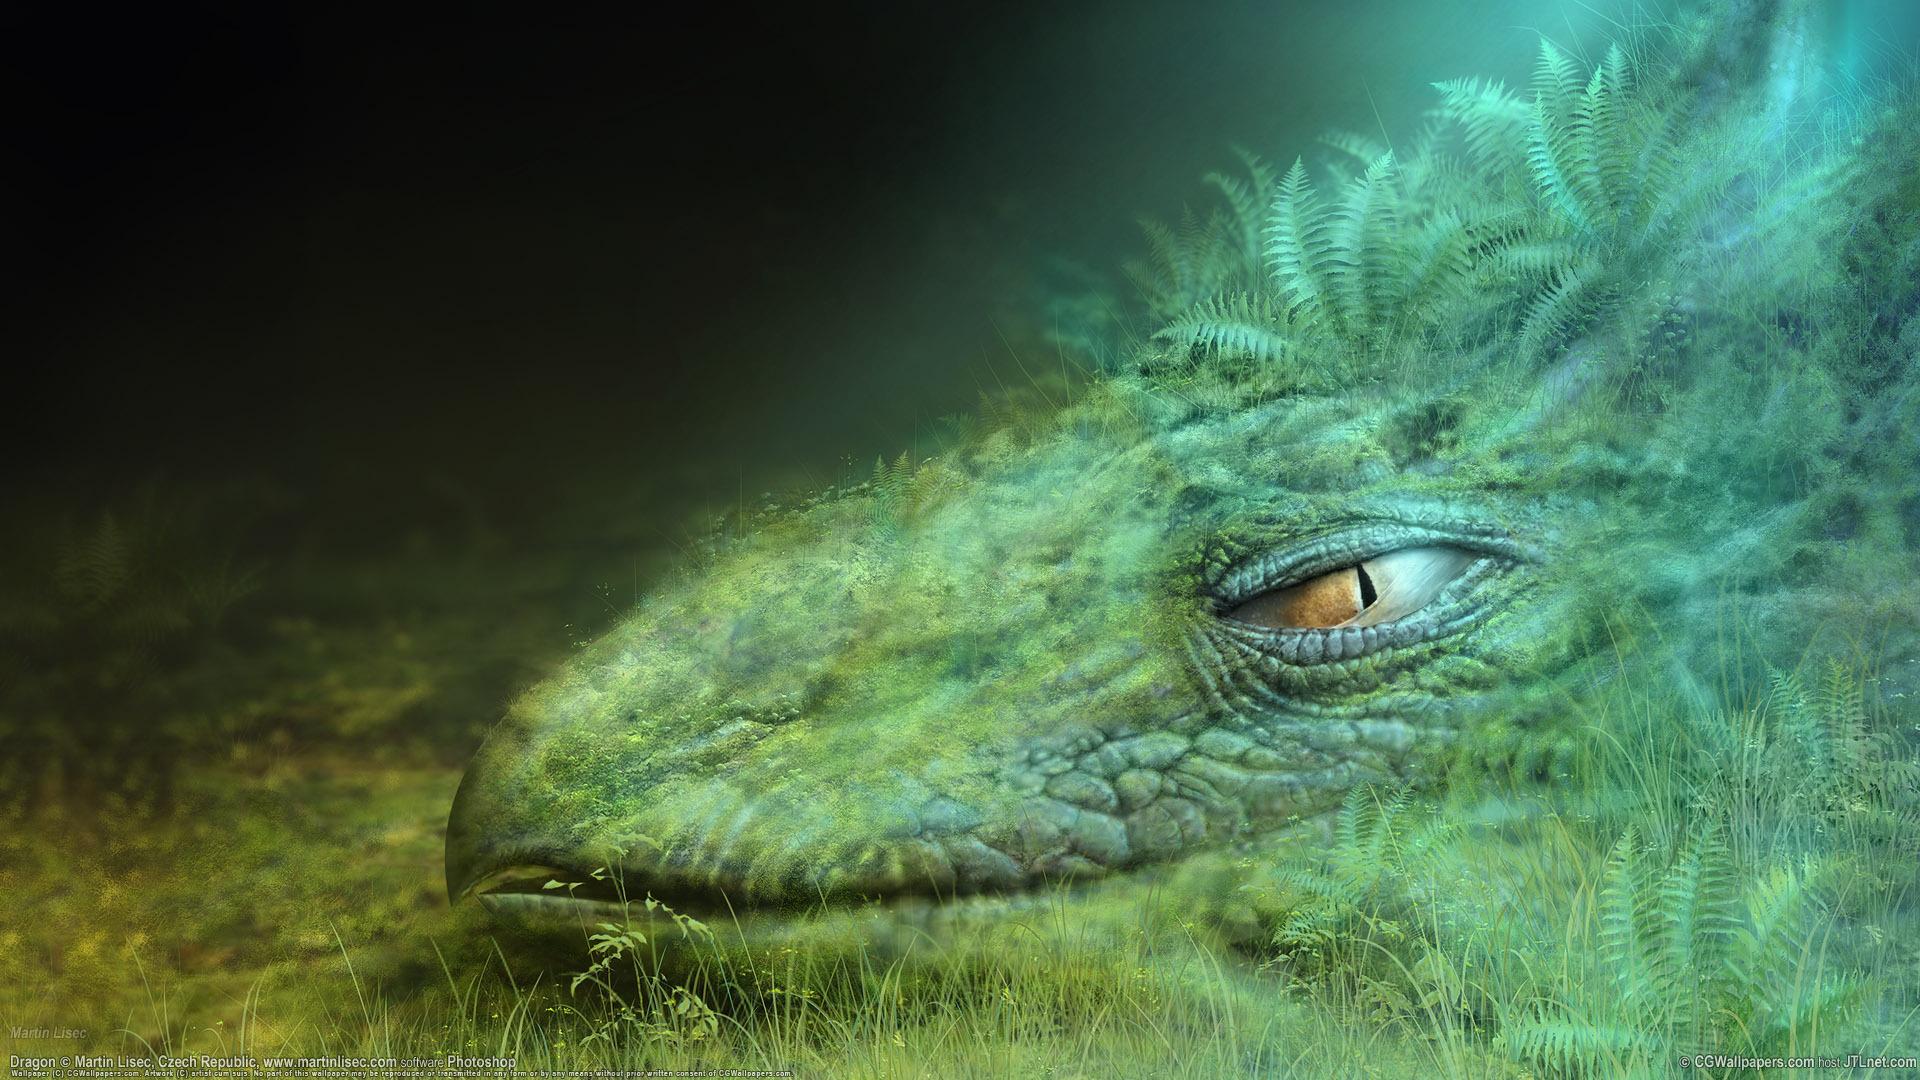 Green Monster wallpaper